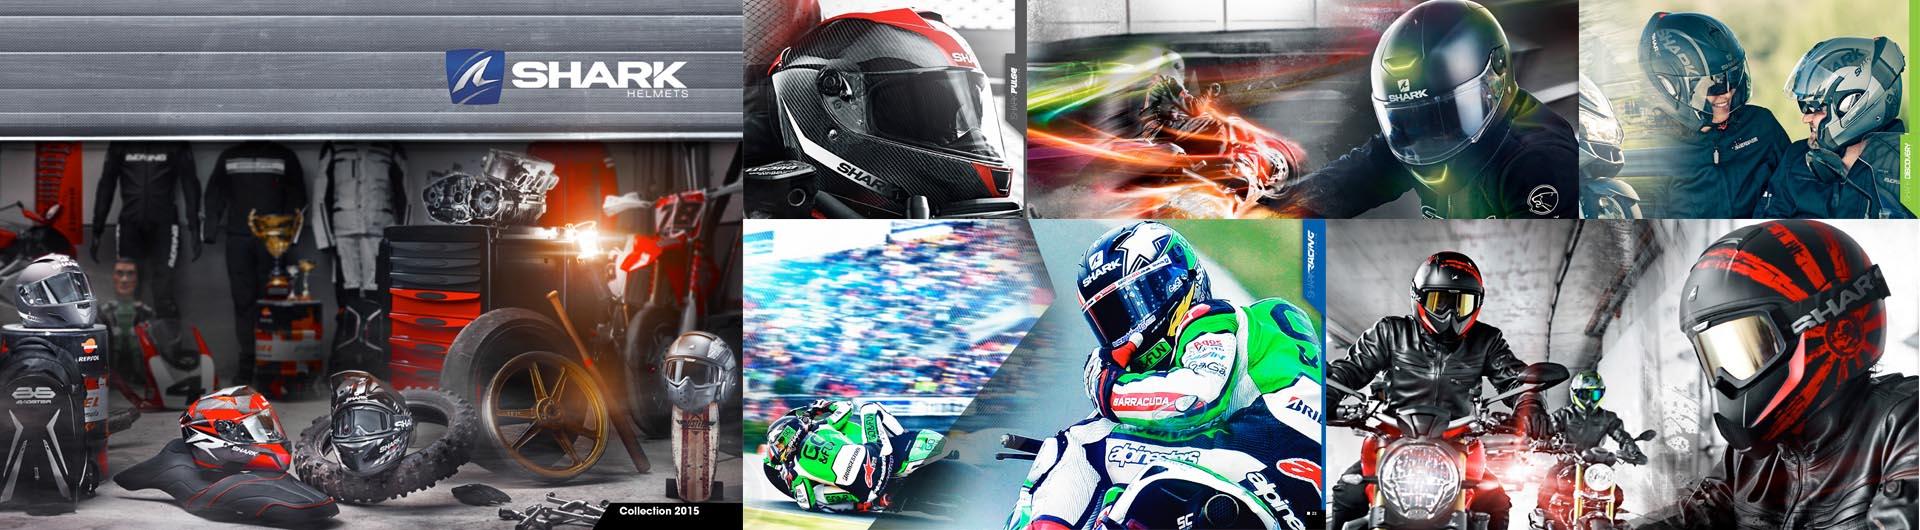 Shark 2015 Motorcycle Helmet Range